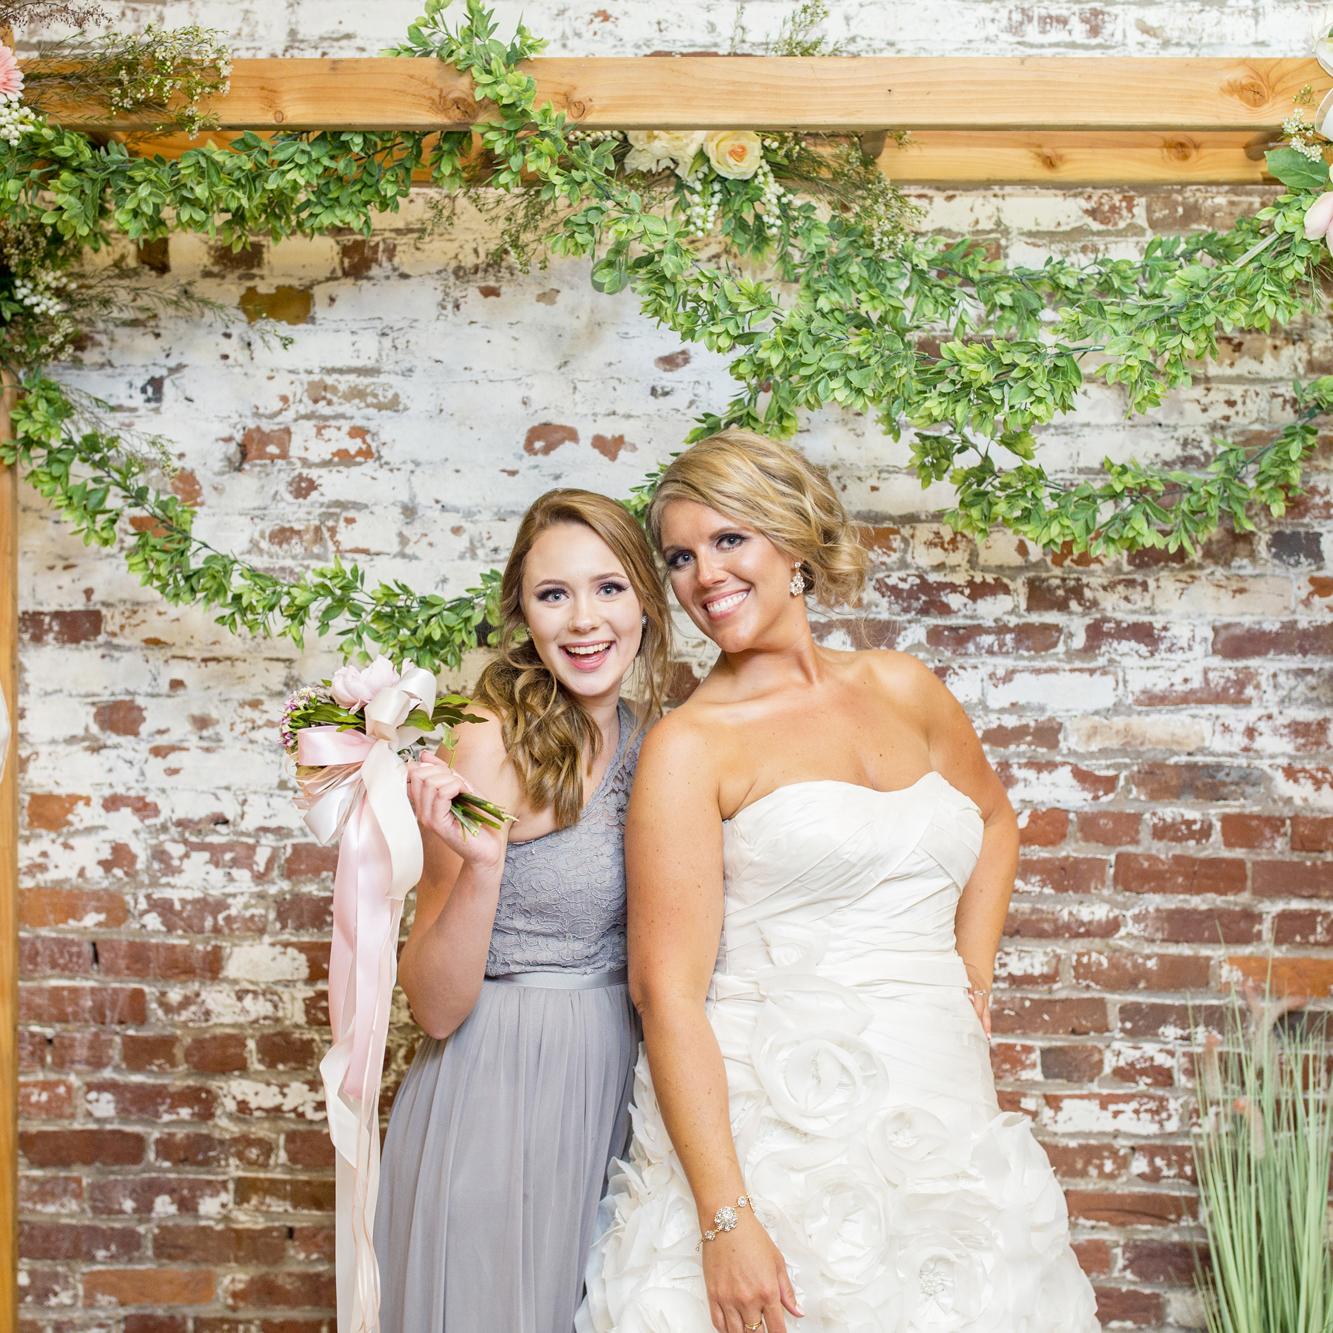 Seriously_Sabrina_Photography_Ashland_Kentucky_Train_Depot_Wedding_Parsons81.jpg